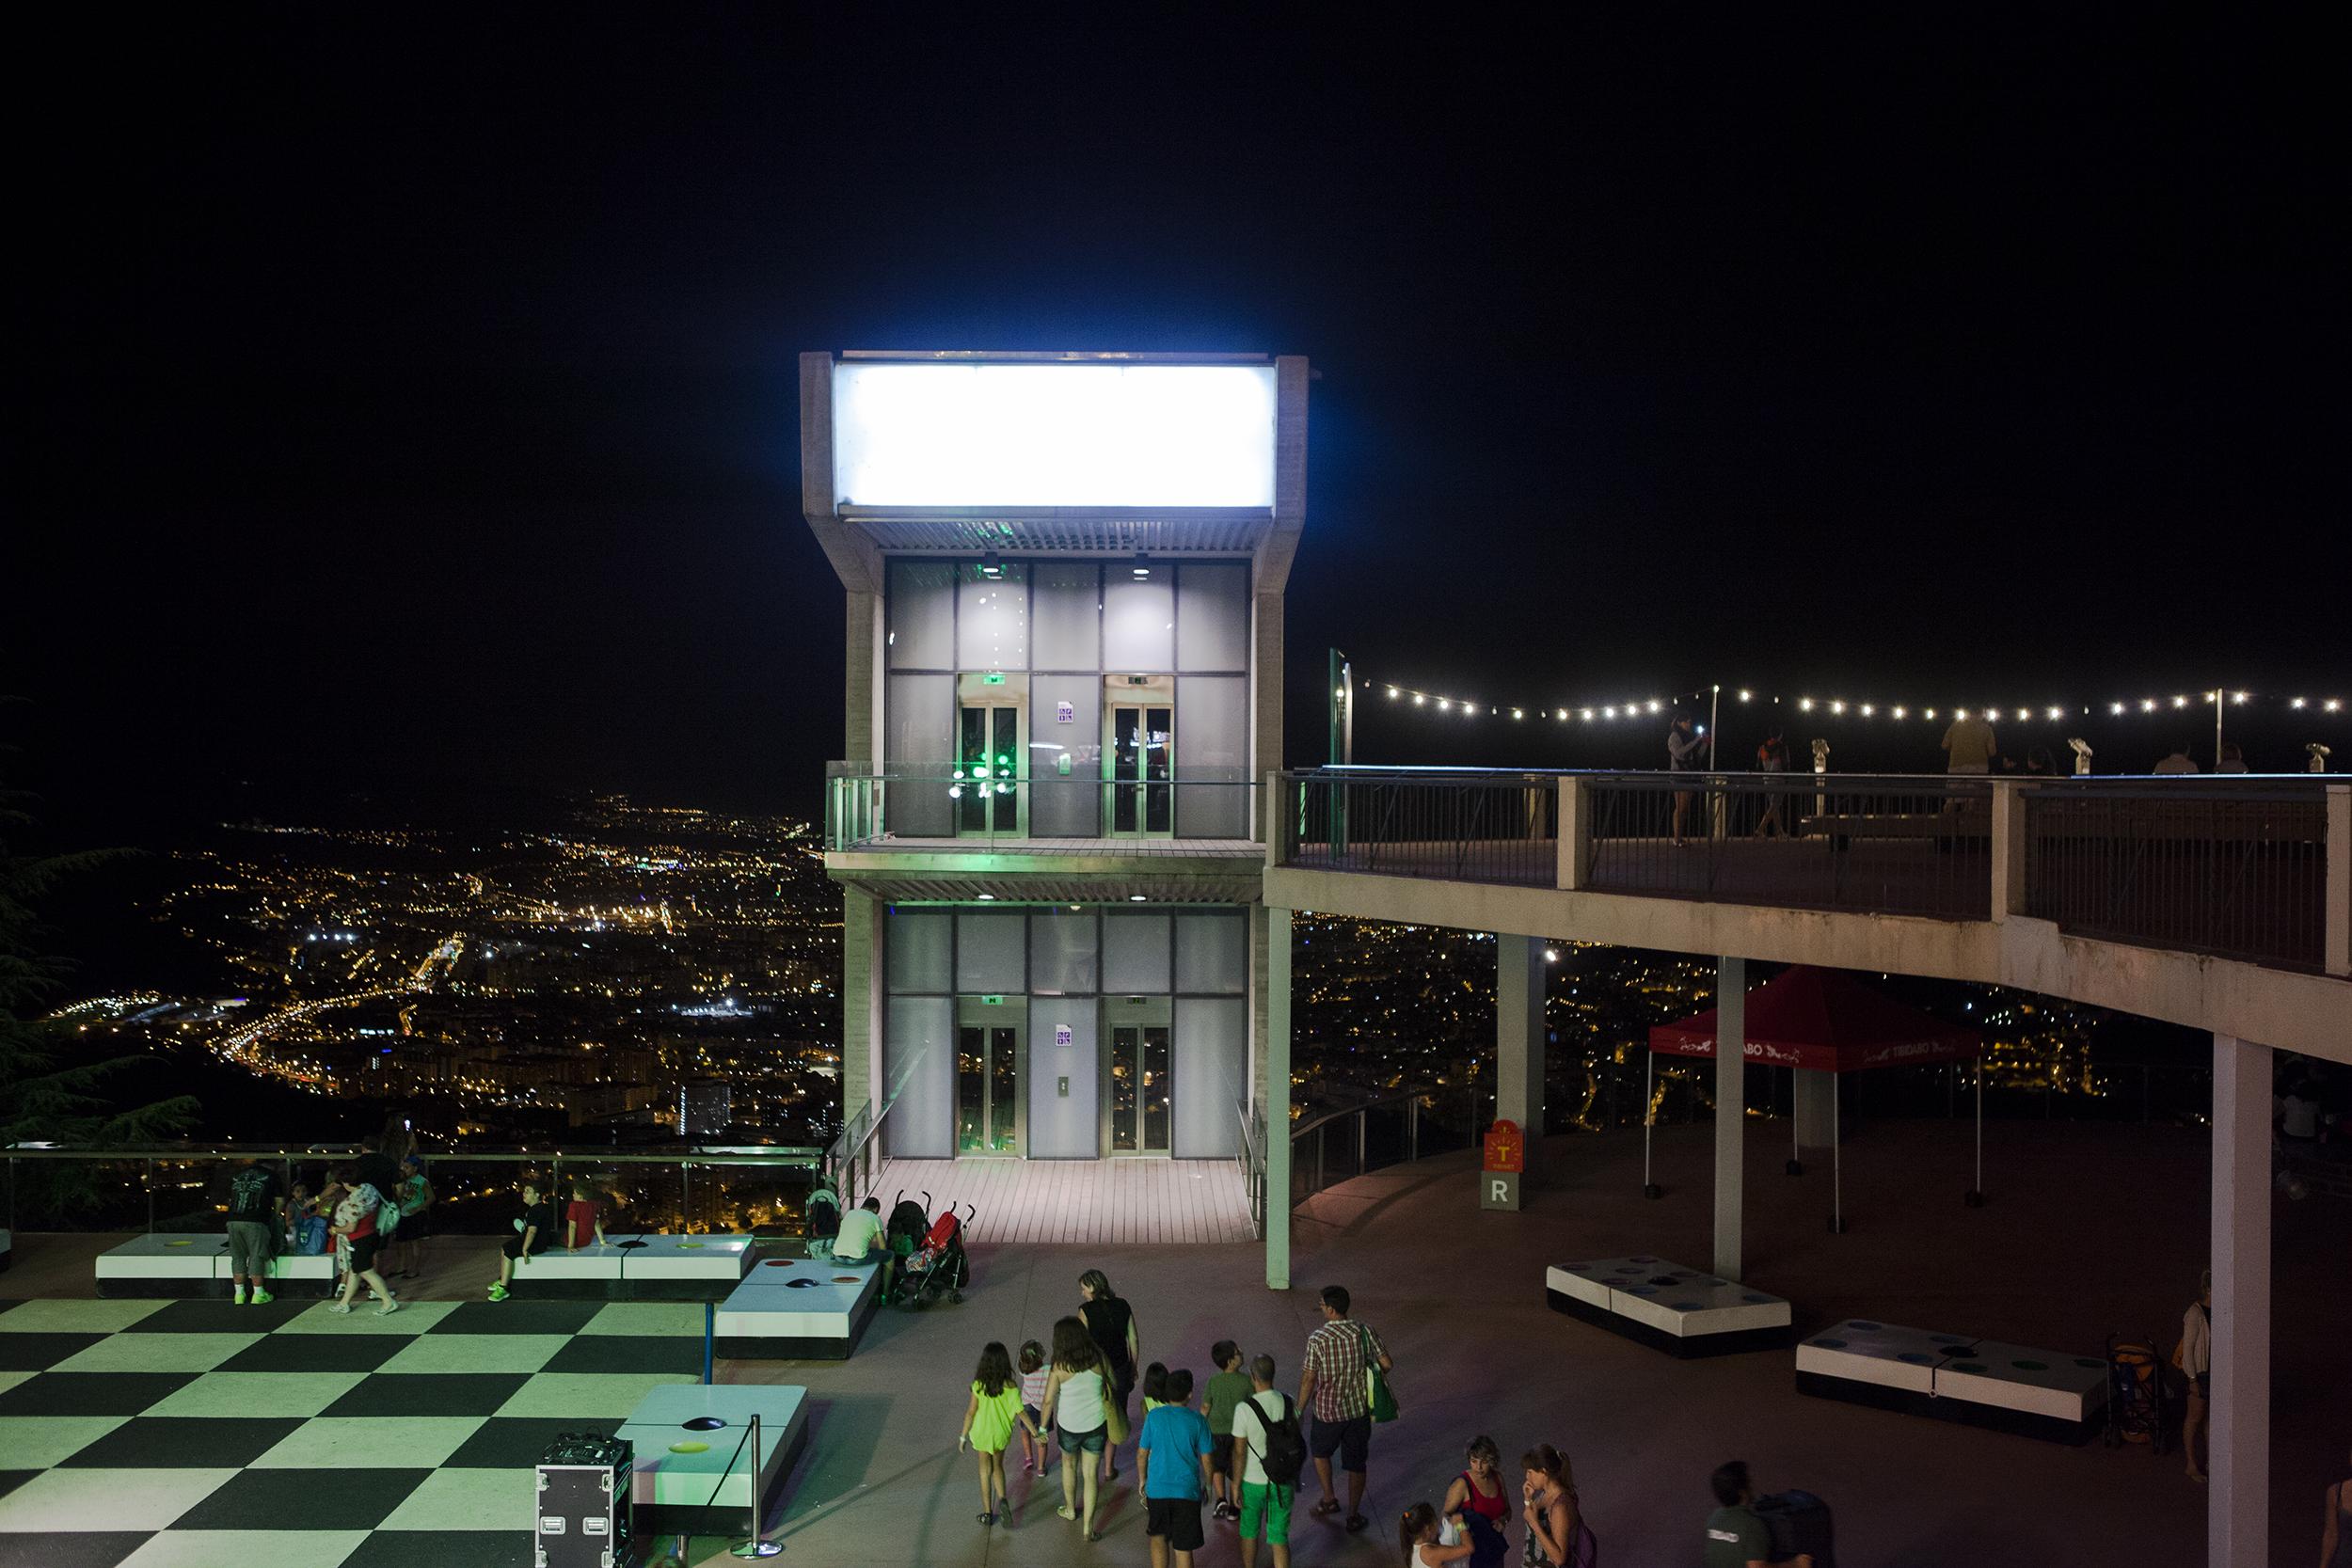 Tibidabo    Amusement Park - Barcelona